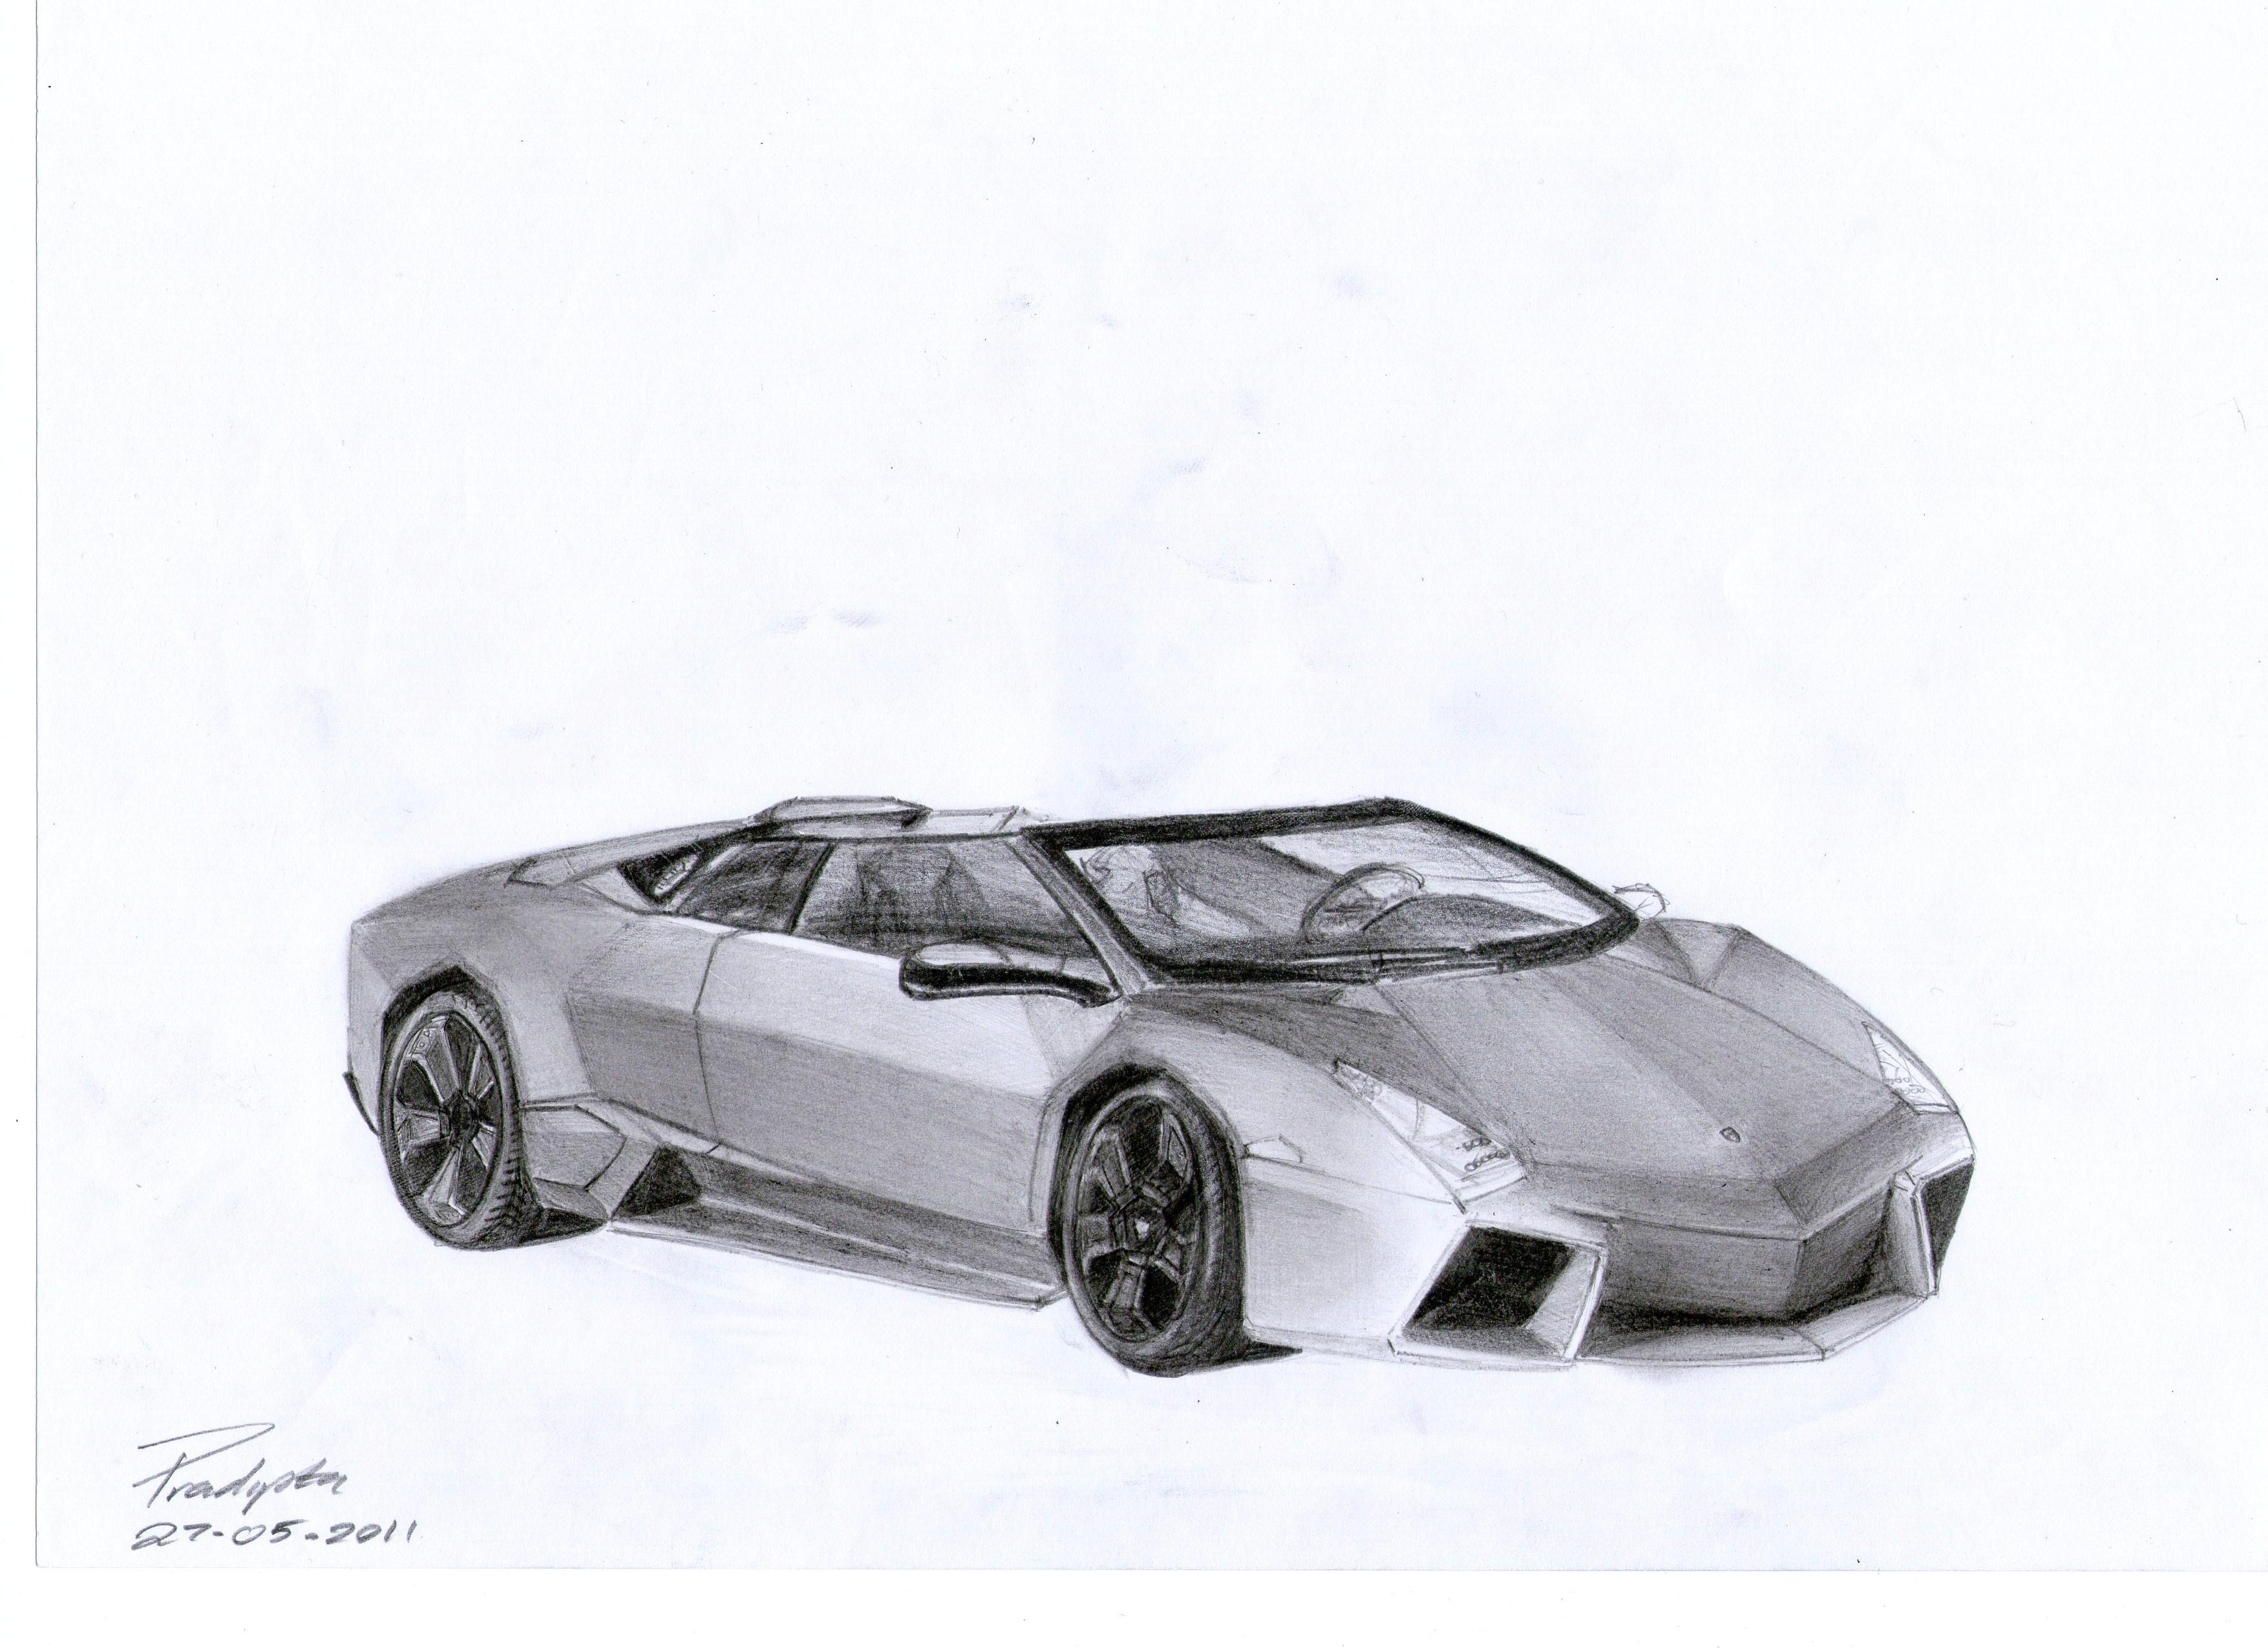 lamborghini reventon drawings - photo #8